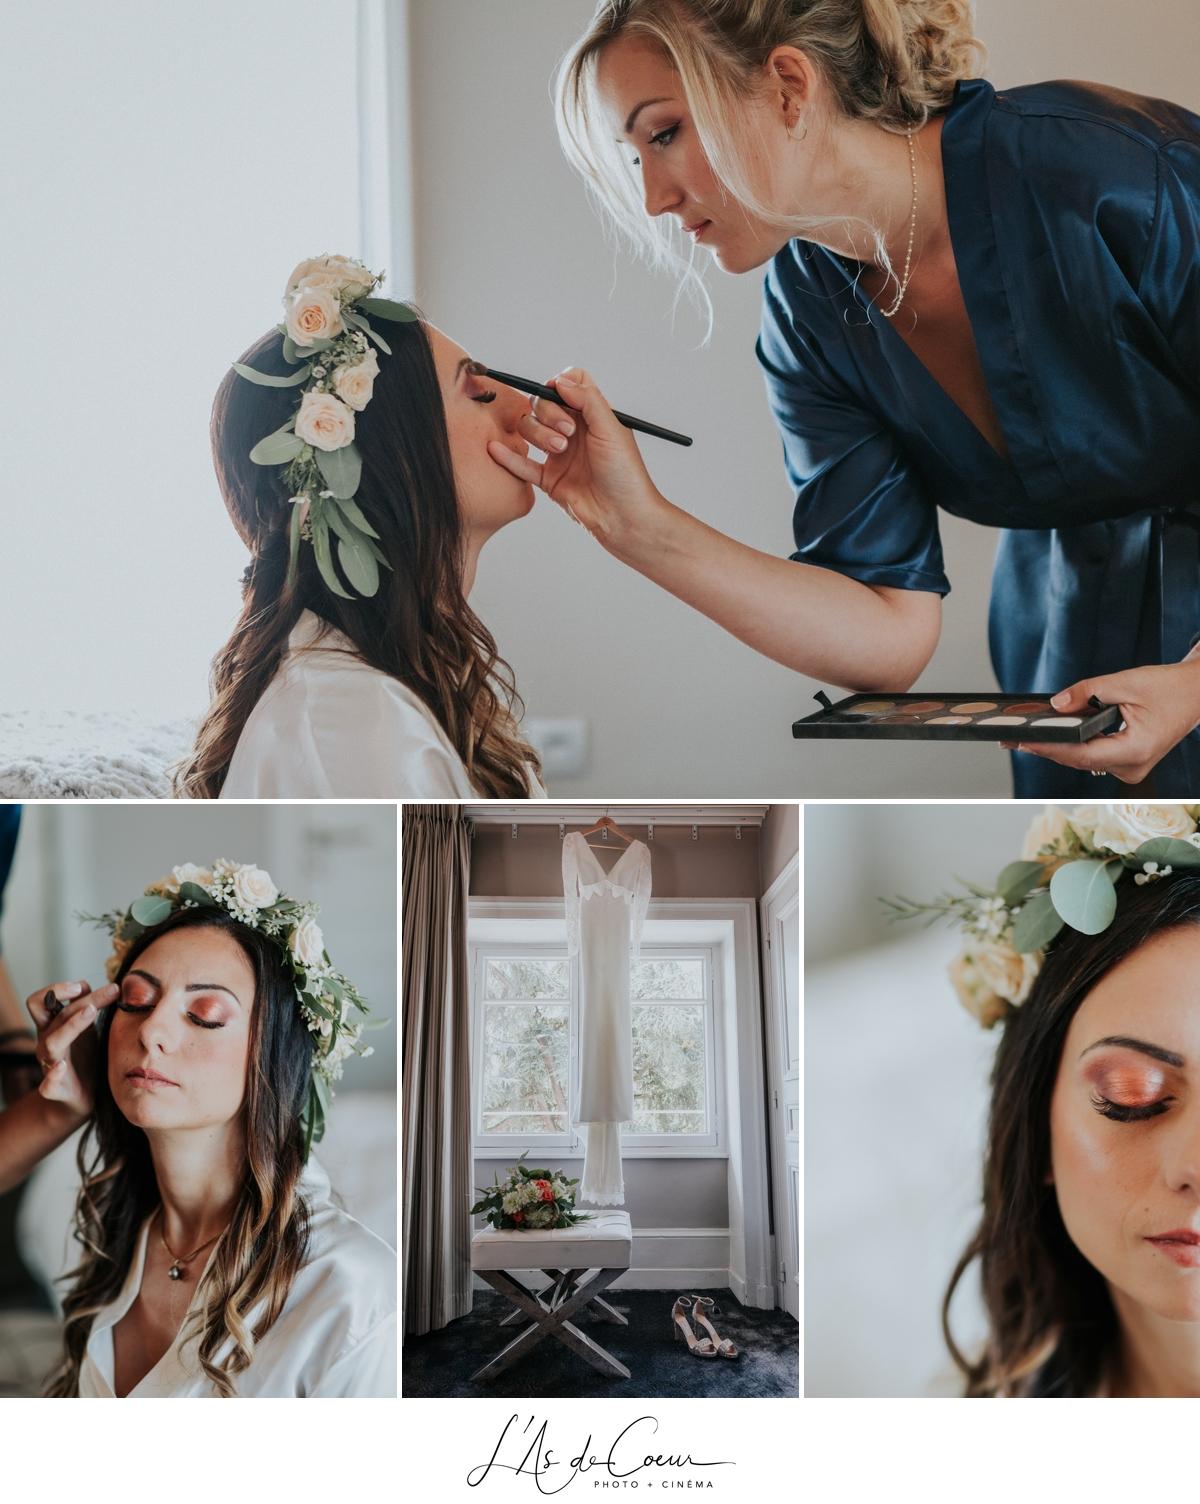 détails make up mariage robe Olympe chaussure mariée Jimmy Choo photographe mariage Lyon ©lasdecoeur